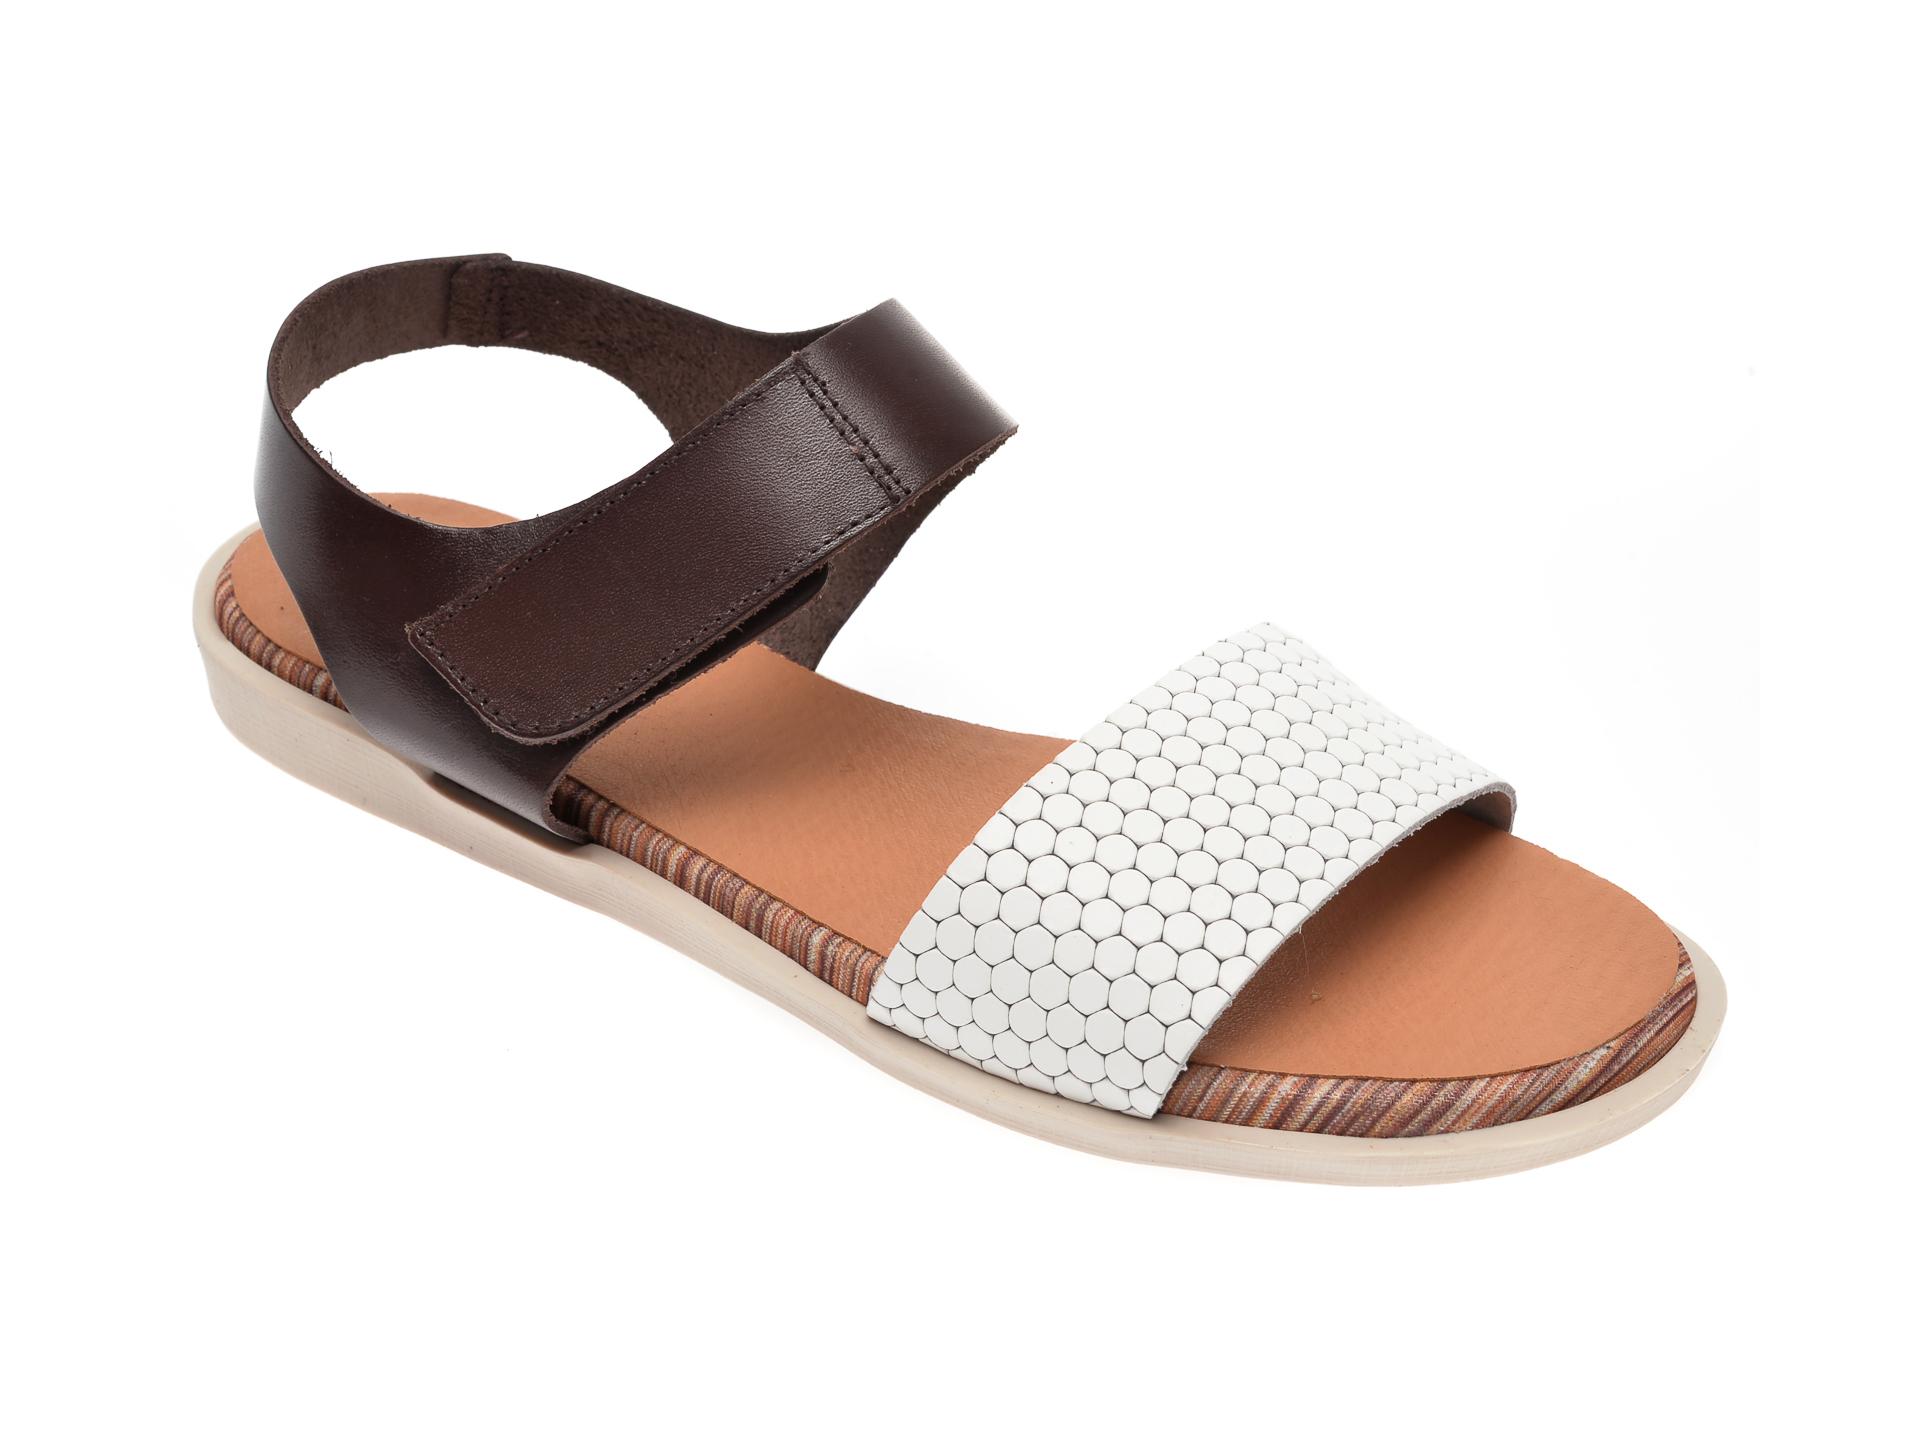 Sandale IMAGE albe, 1242, din piele naturala imagine